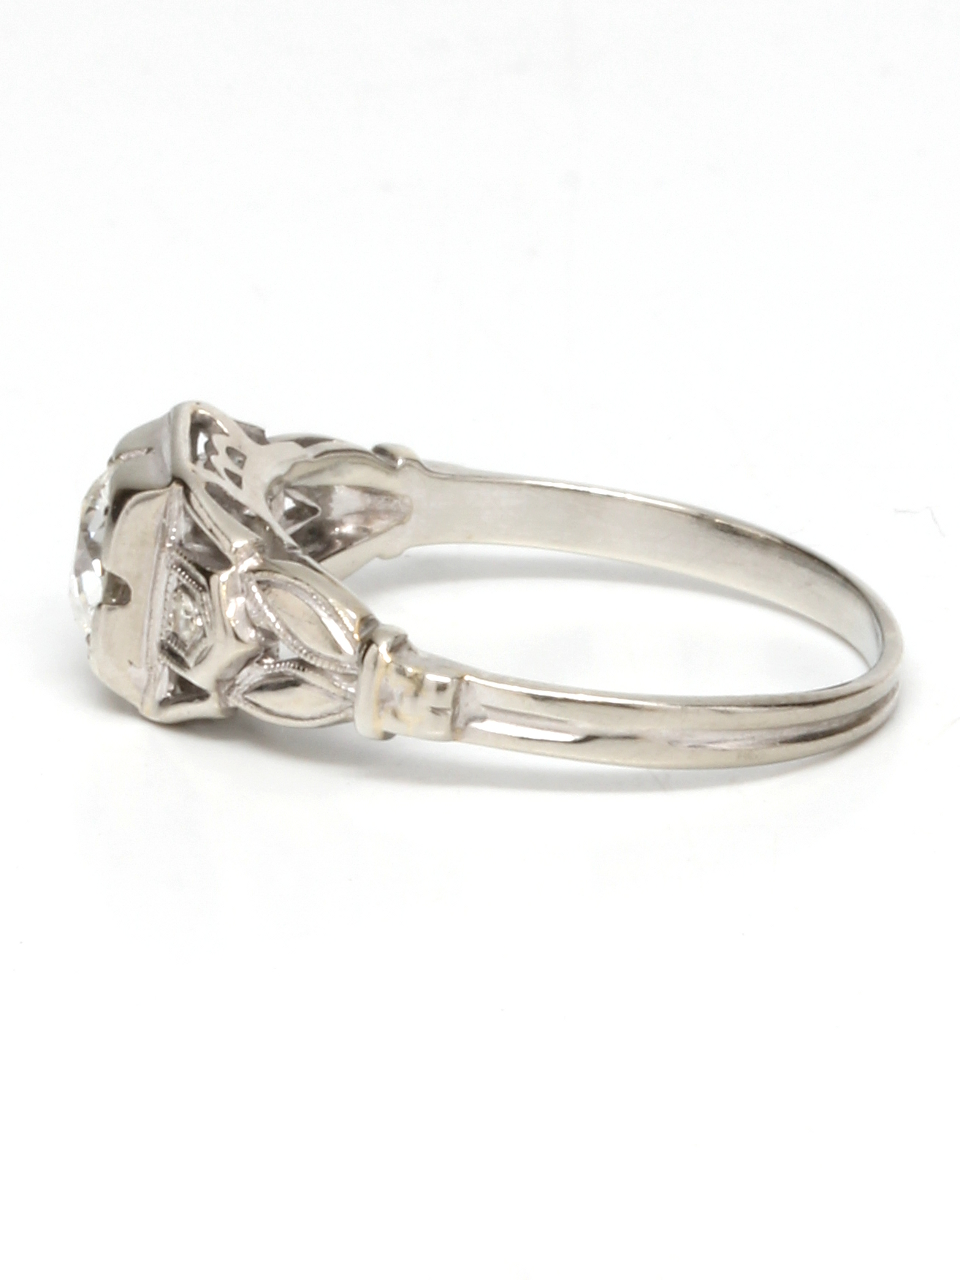 Vintage 18K WG  Diamond Engagement Ring 18K WG 0.50ct I-SI1 1930's